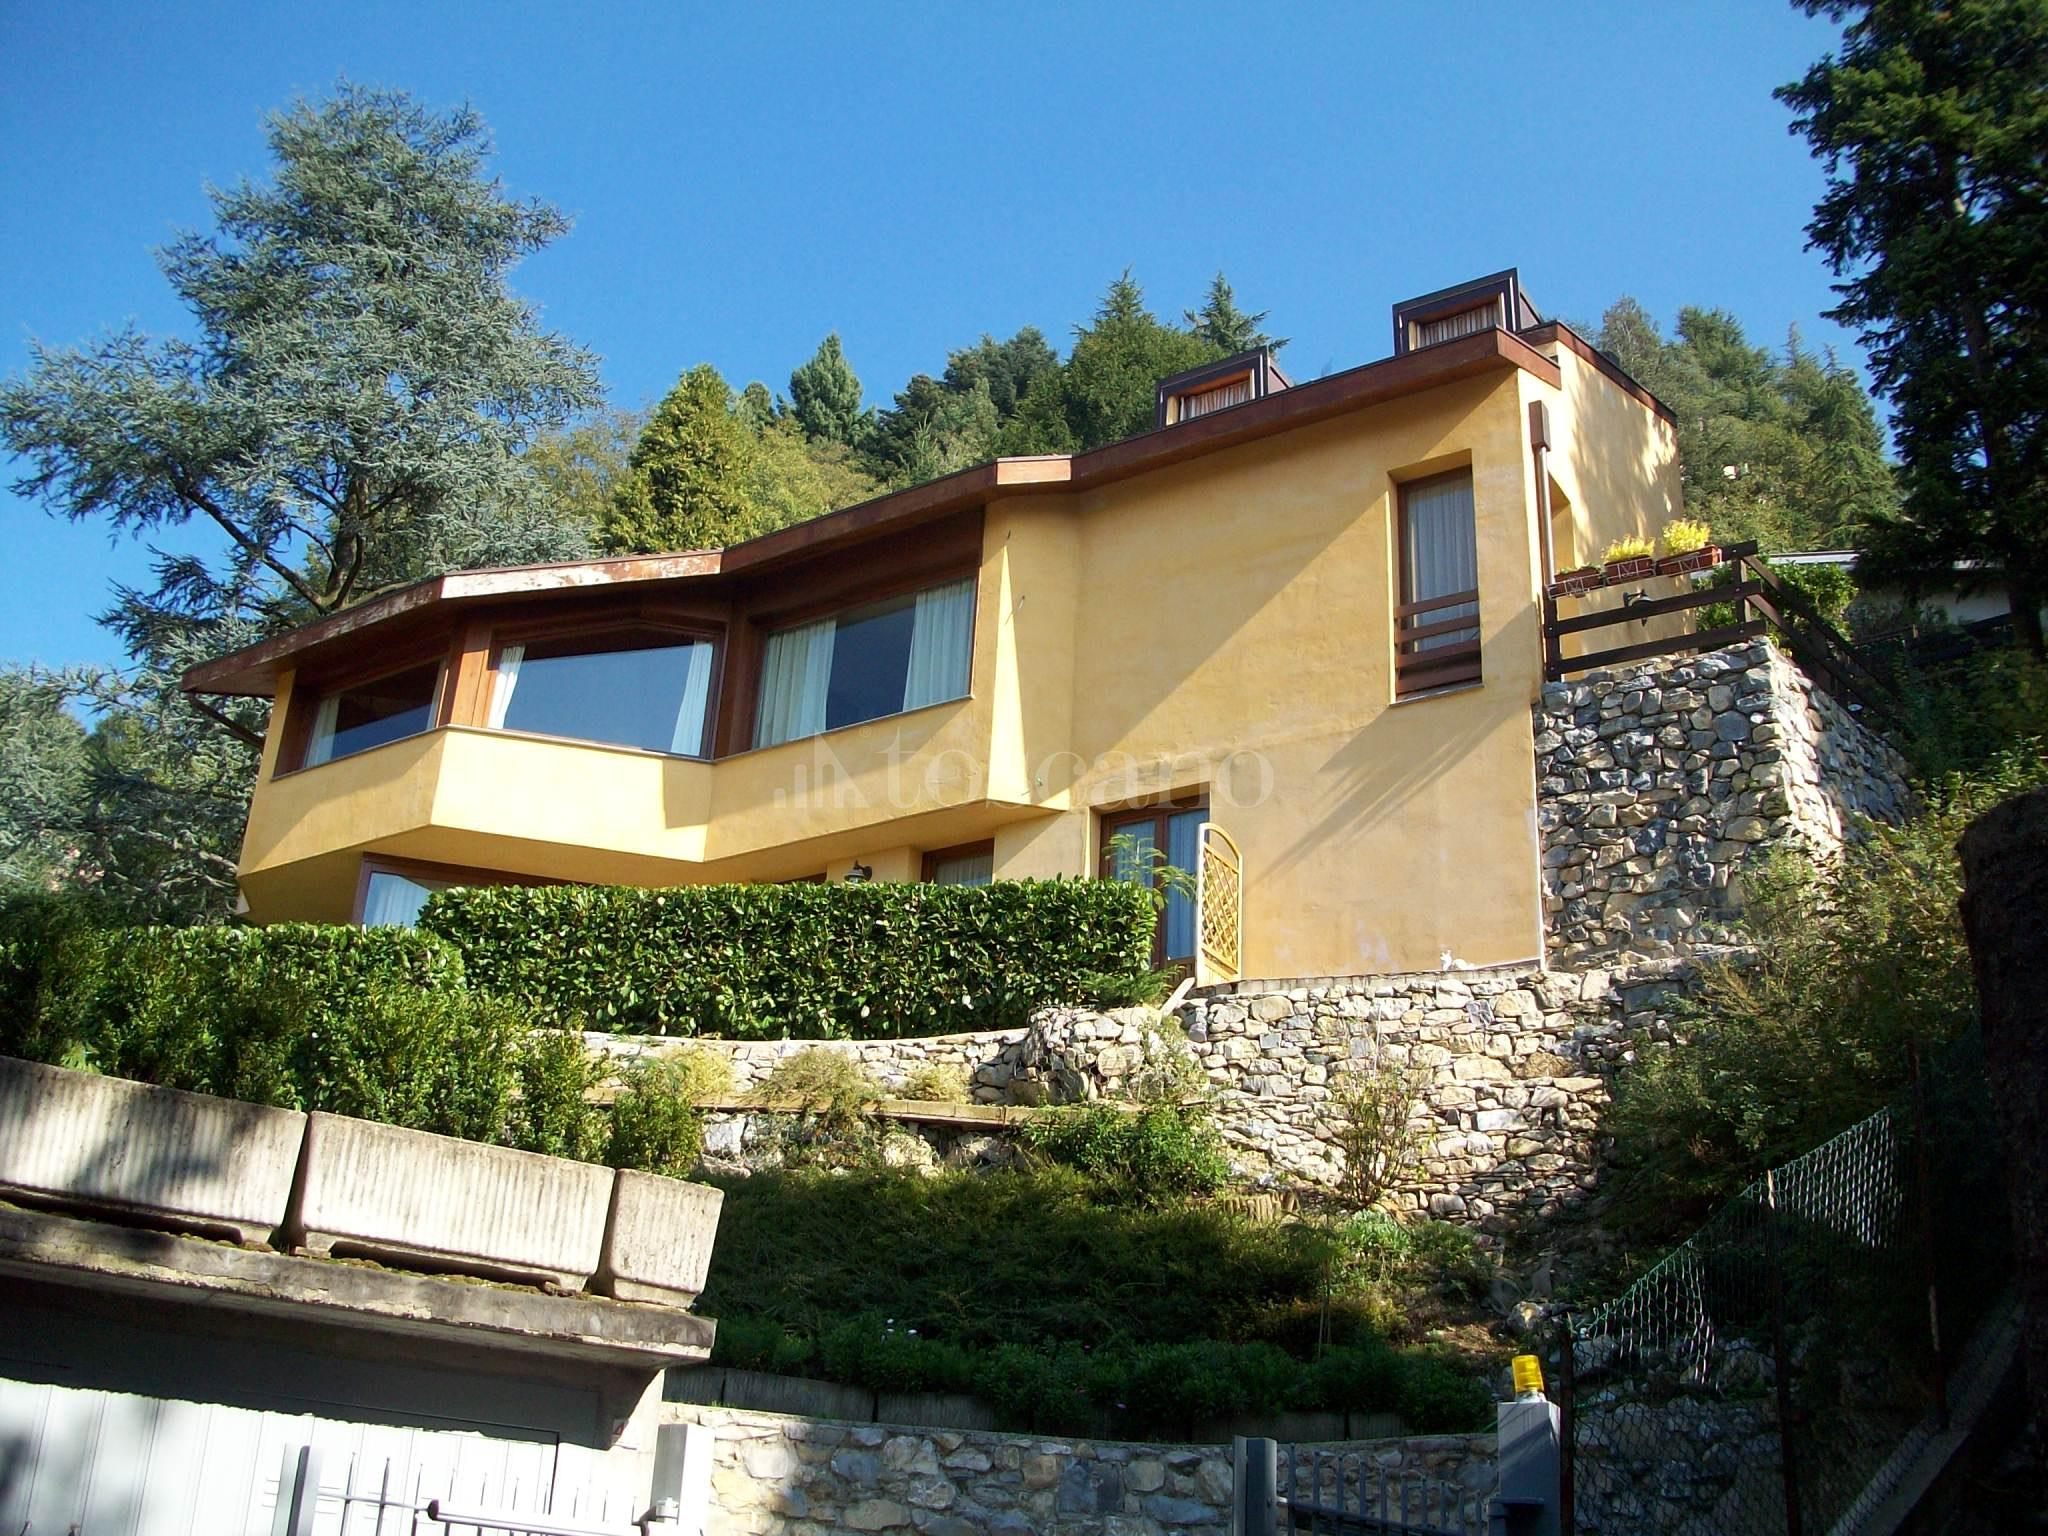 Vendita villa a brunate in via ai piani brunate 68 2017 for Piani di villa italiana